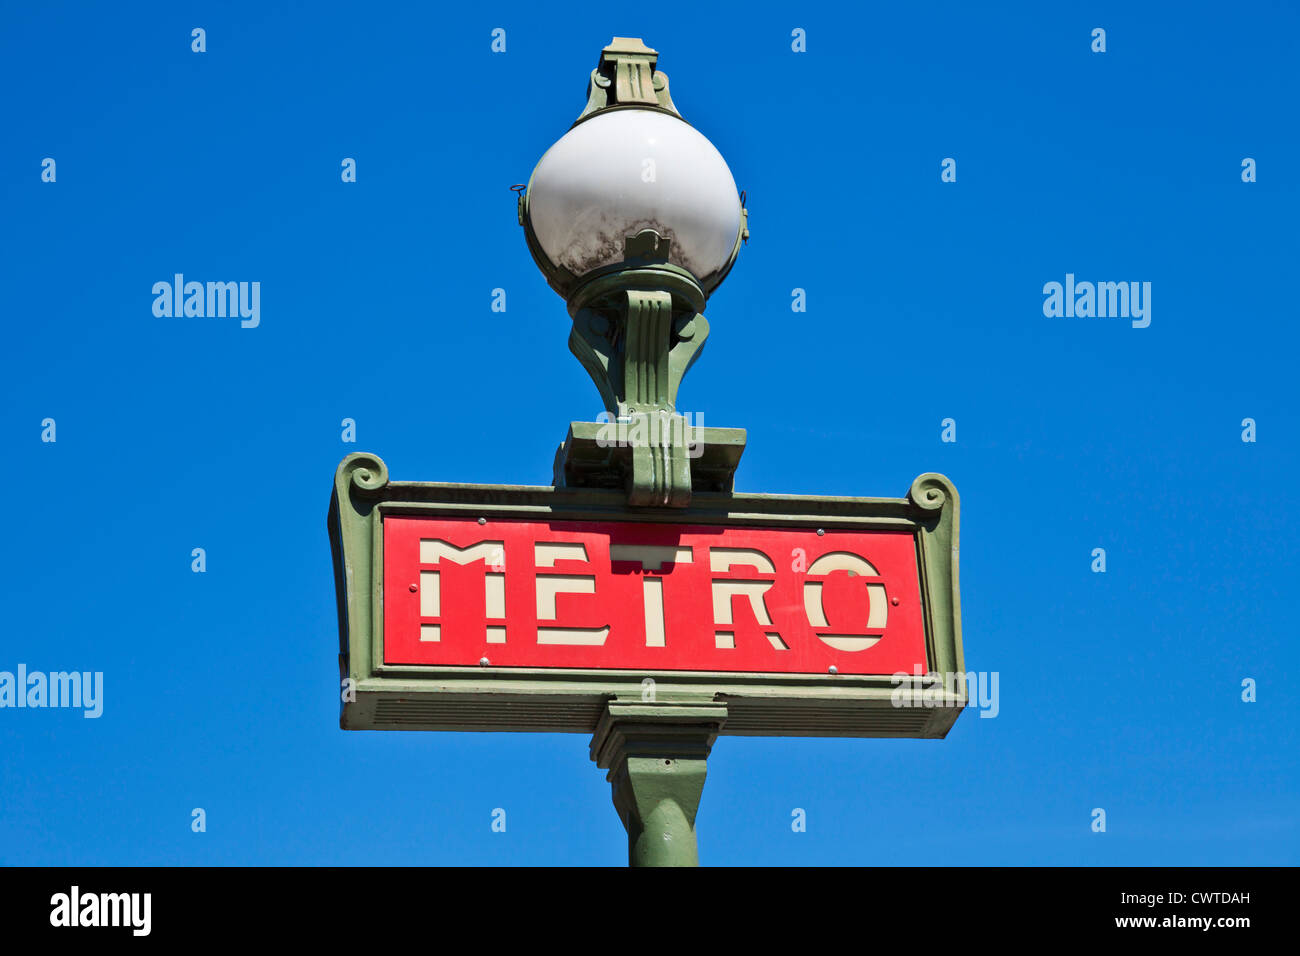 Paris métro signer contre un ciel bleu clair France EU Europe Photo Stock